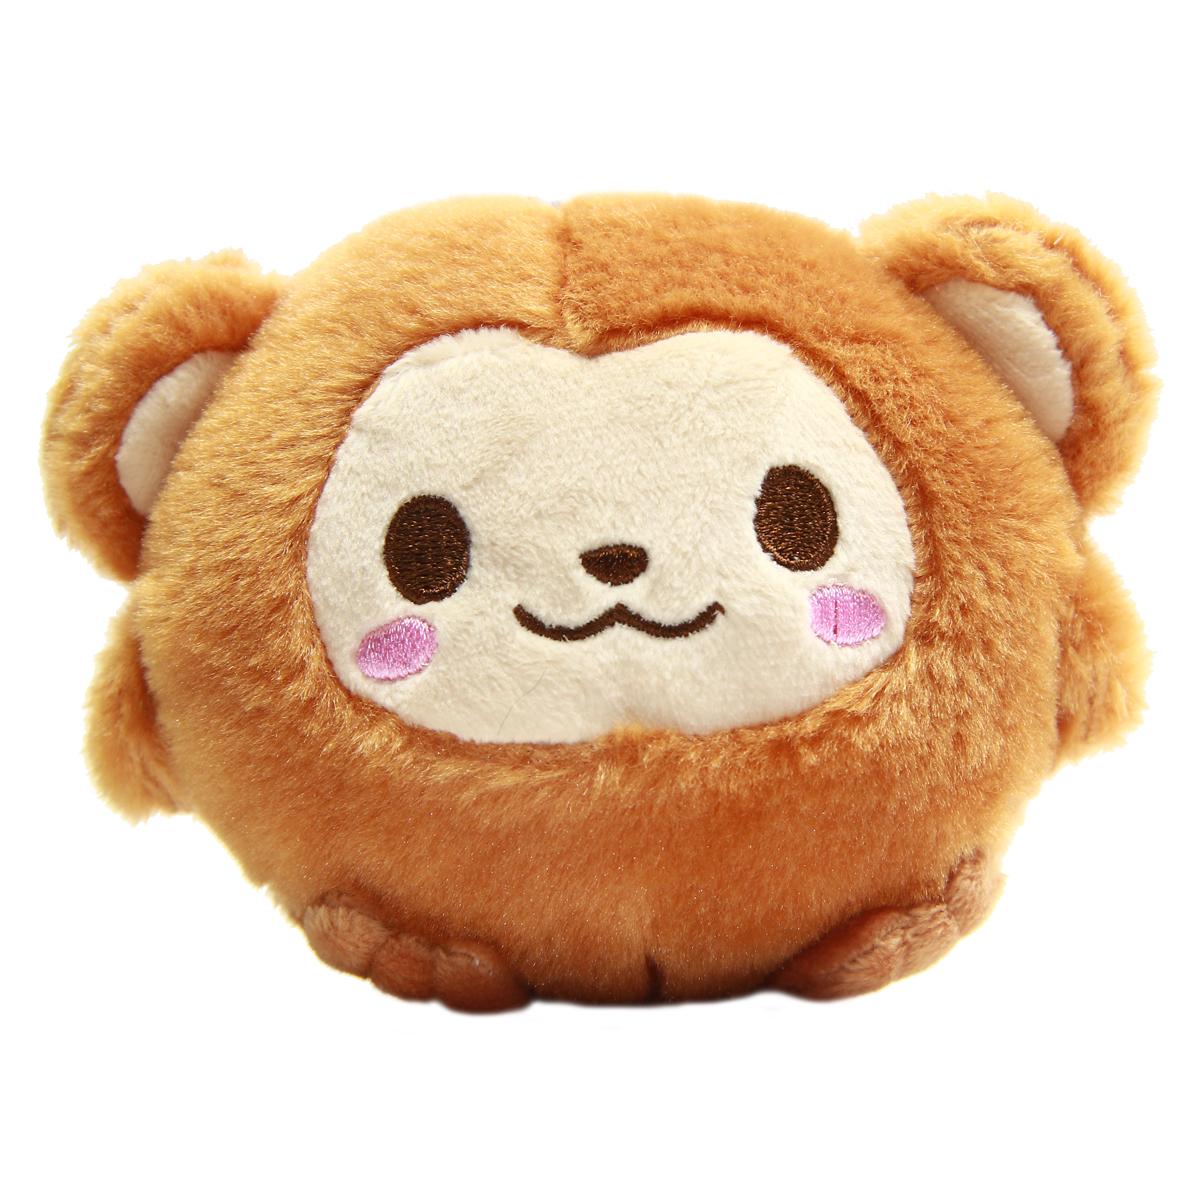 Monkey Plush Doll Kawaii Stuffed Animal Soft Fuzzy Squishy Plushie Mochi Brown